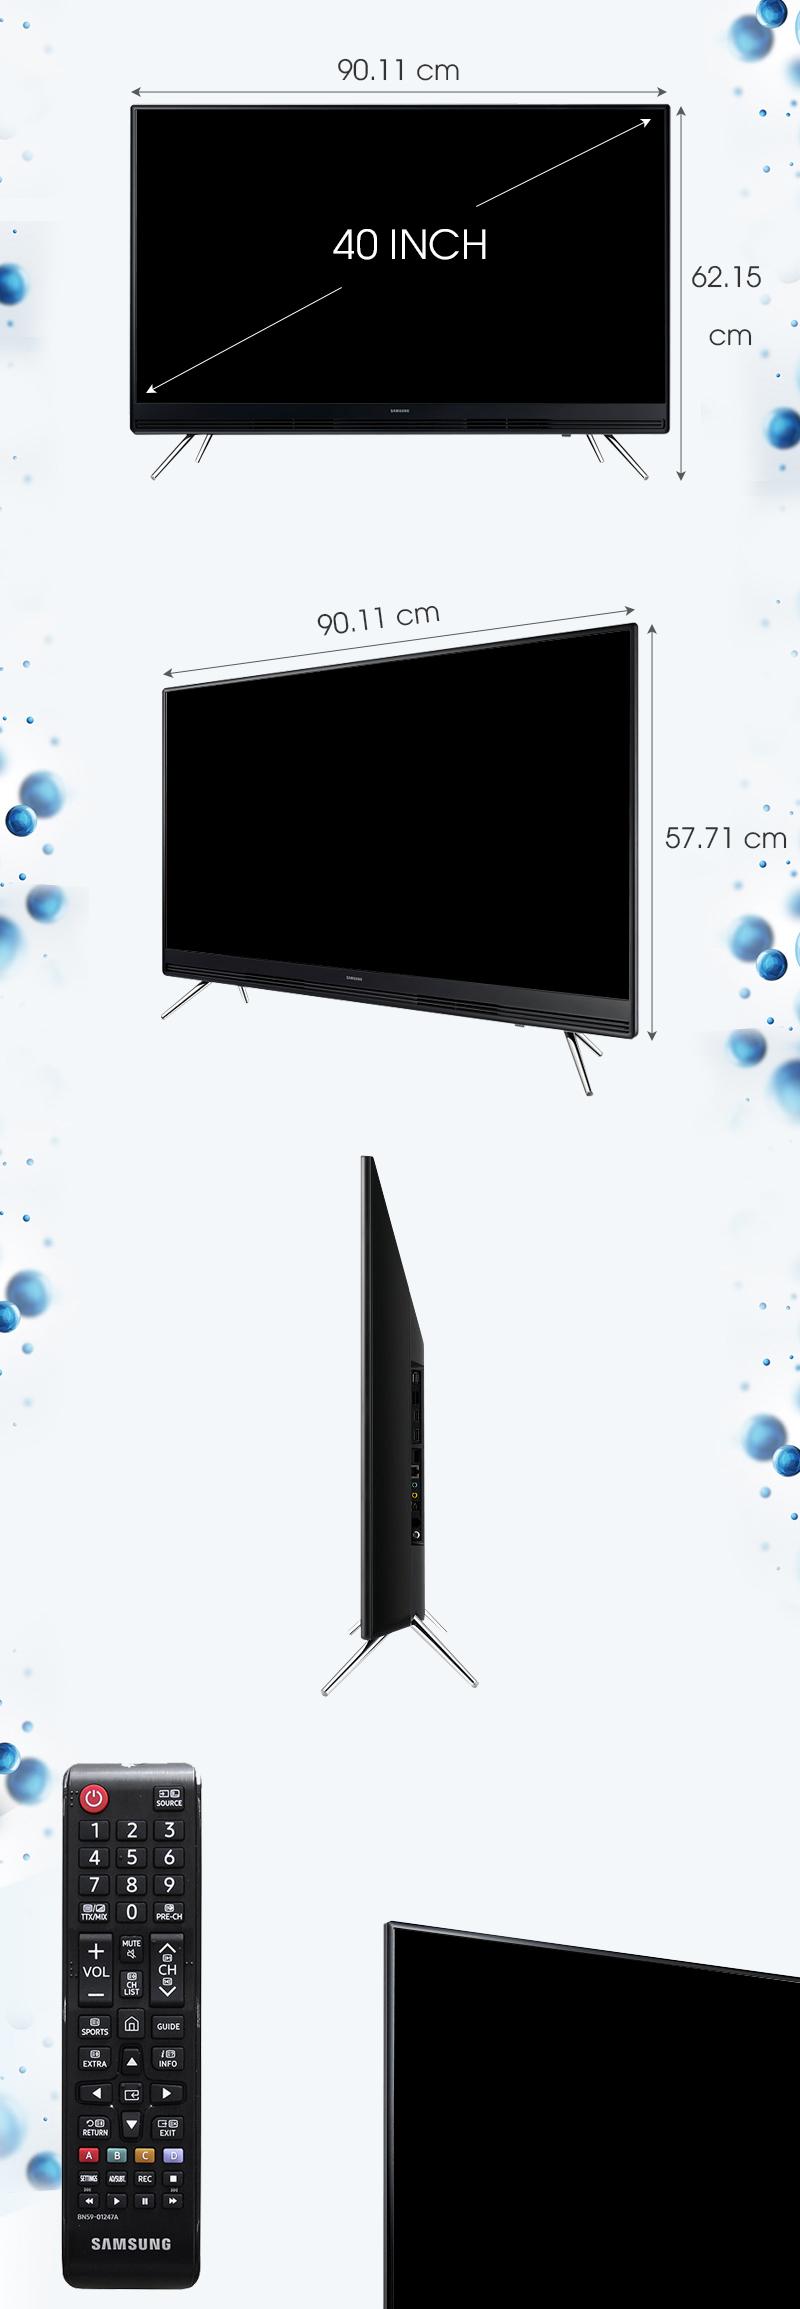 Smart Tivi Samsung 40 inch UA40K5300 - Kích thước tivi